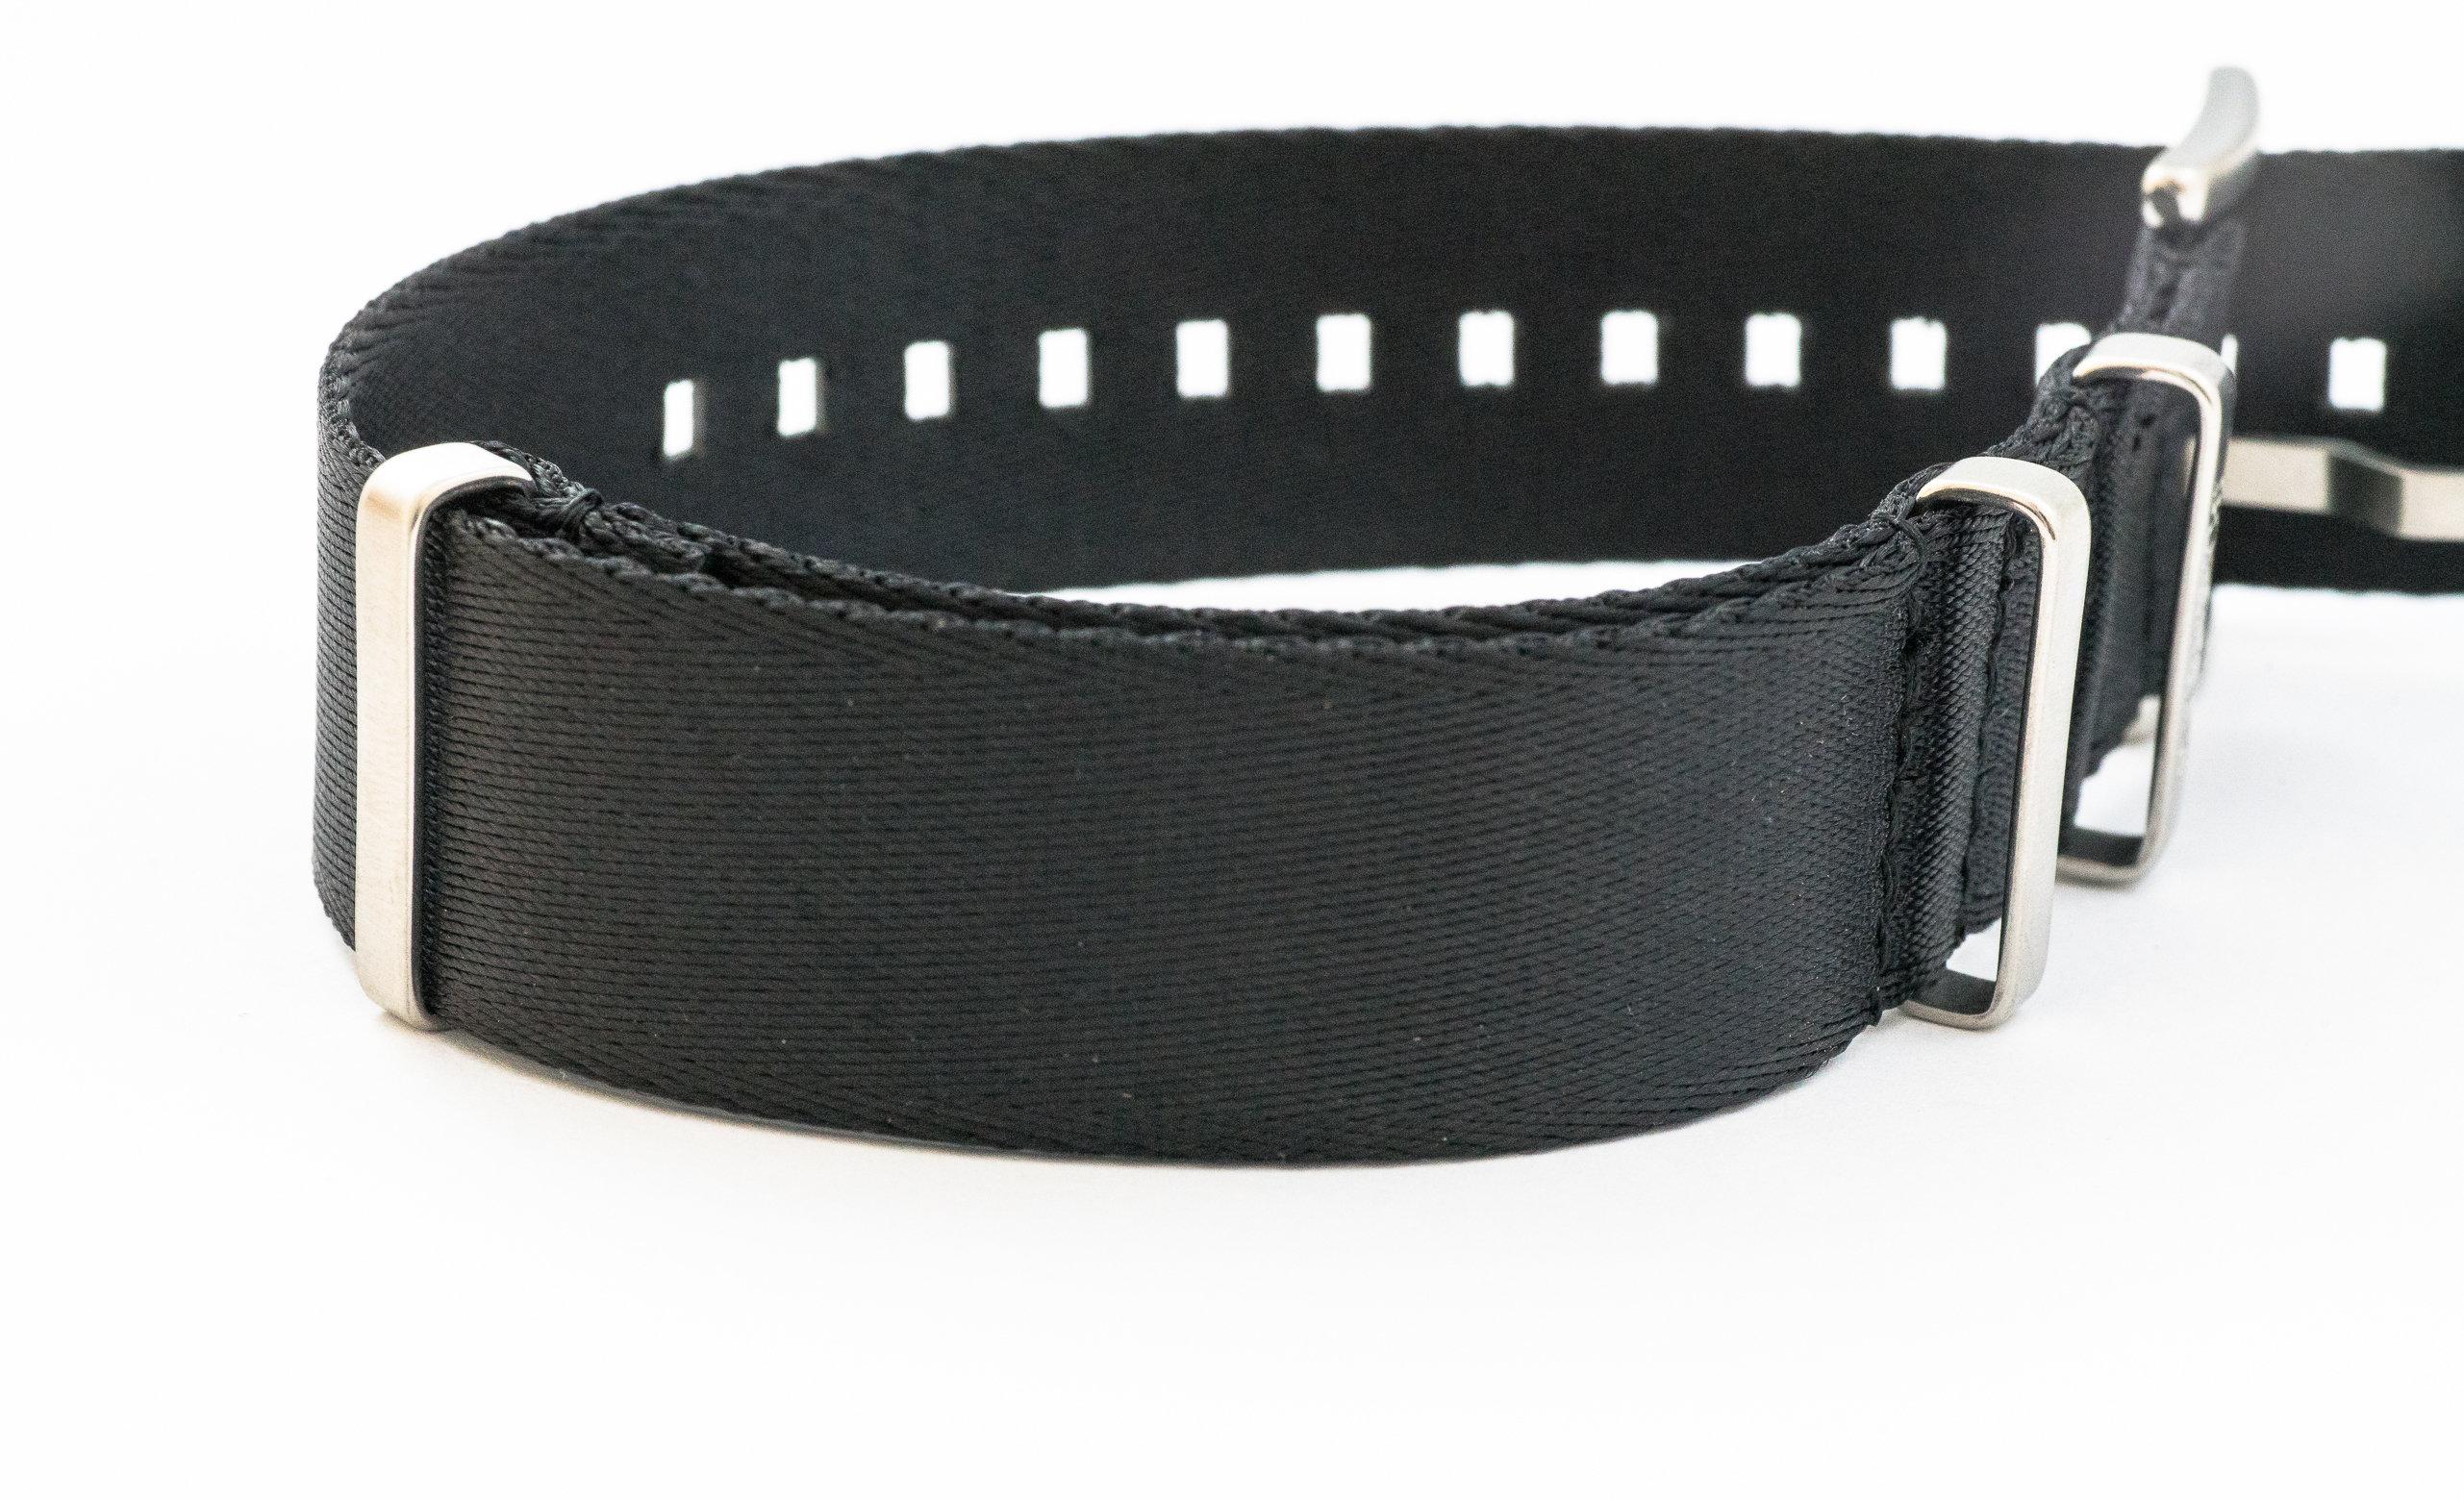 Borealis premium Nato style seatbelt 1.2mm nylon weave strap 20mm size black